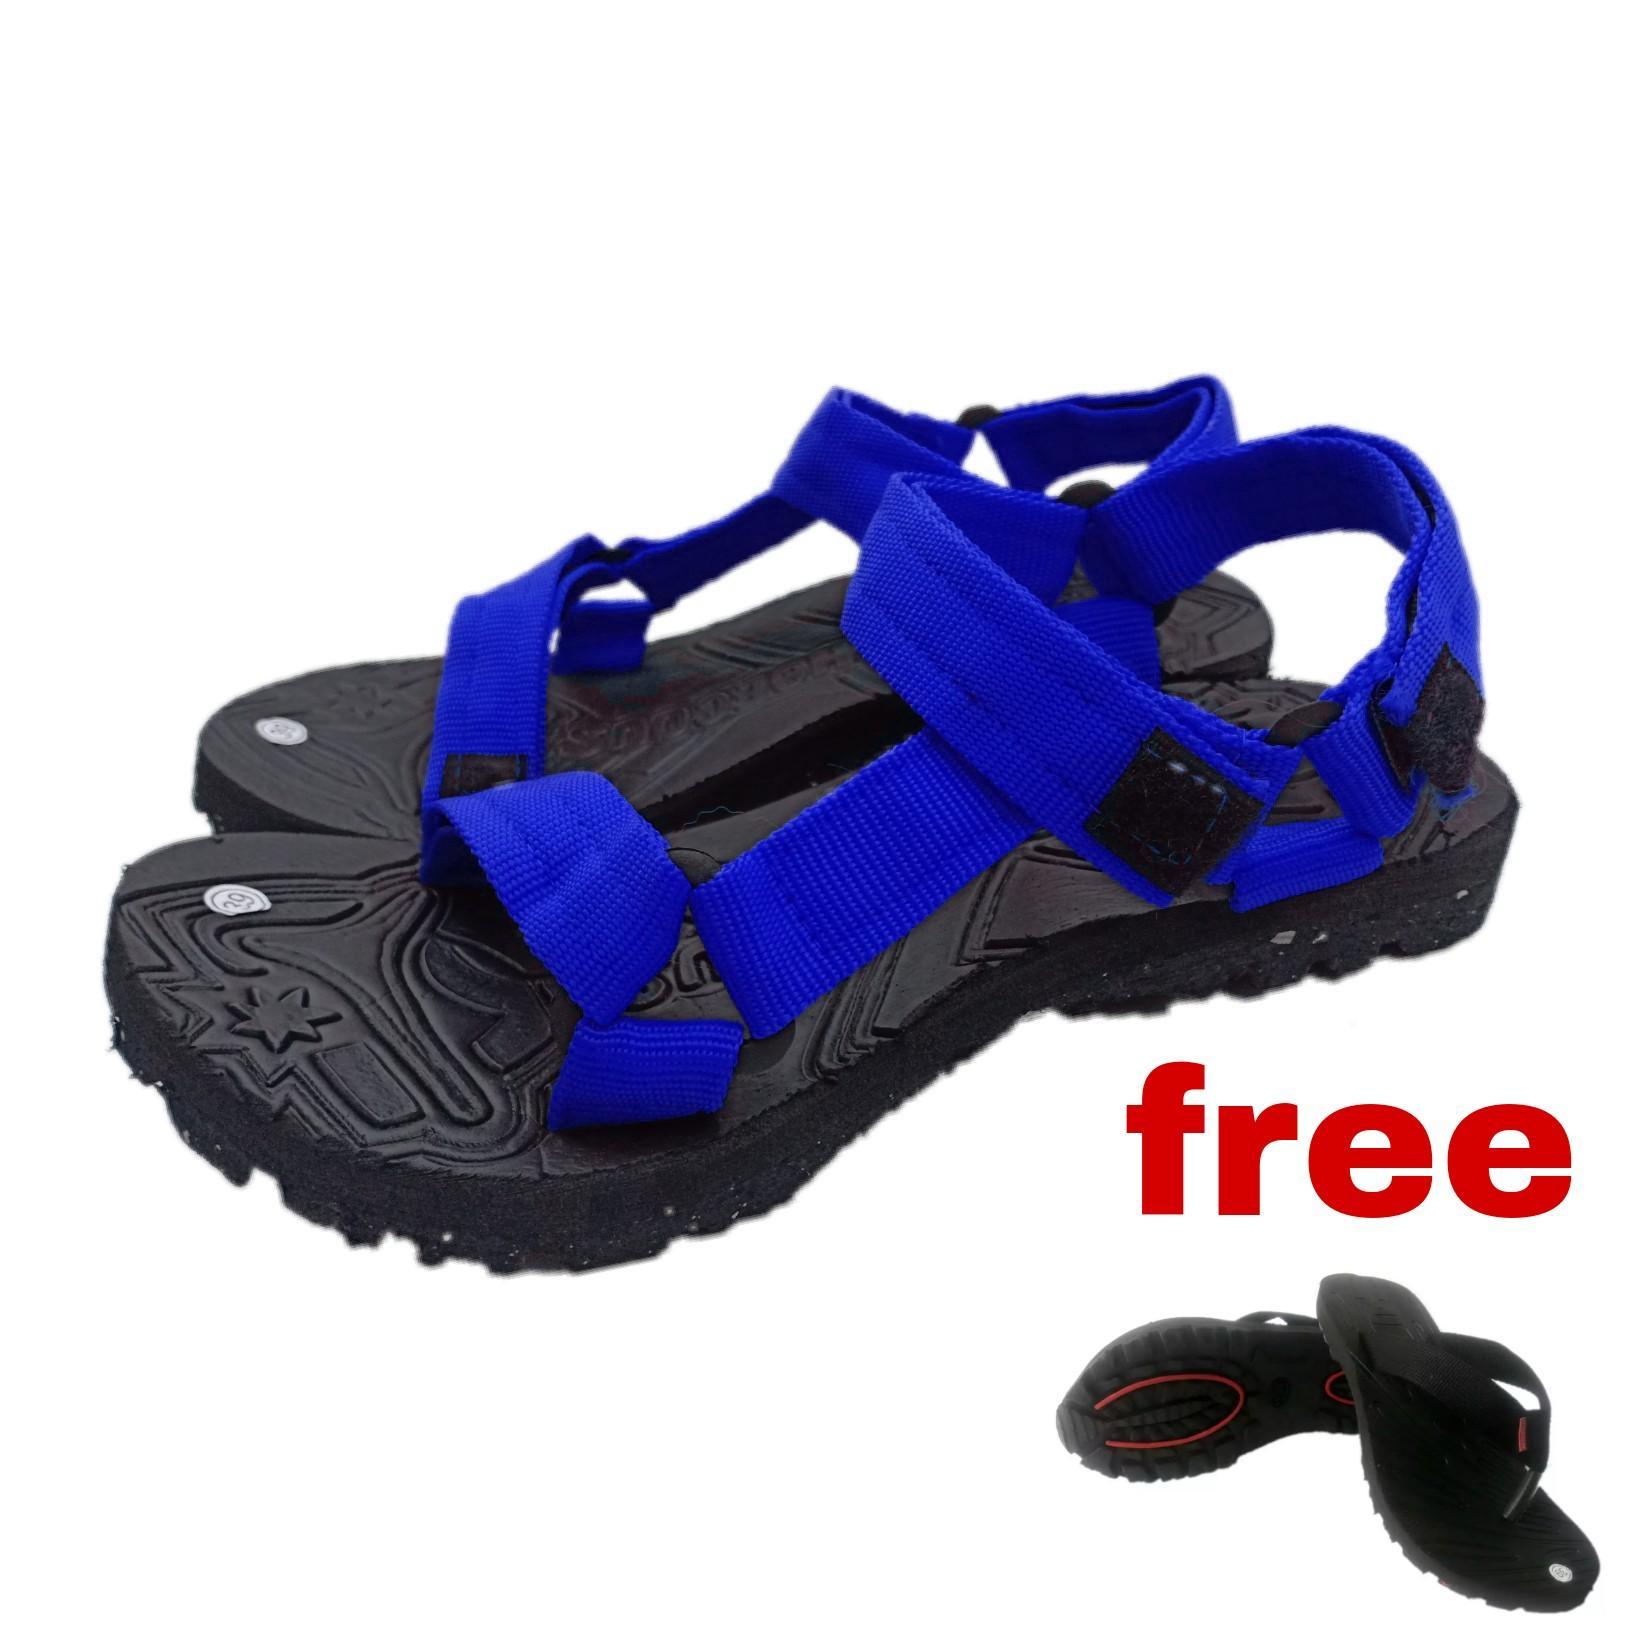 Arsy Sport / Sandal Gunung Pria / Sandal selop / Sandal Pria / Sandal Murah - Free Sandal Jepit